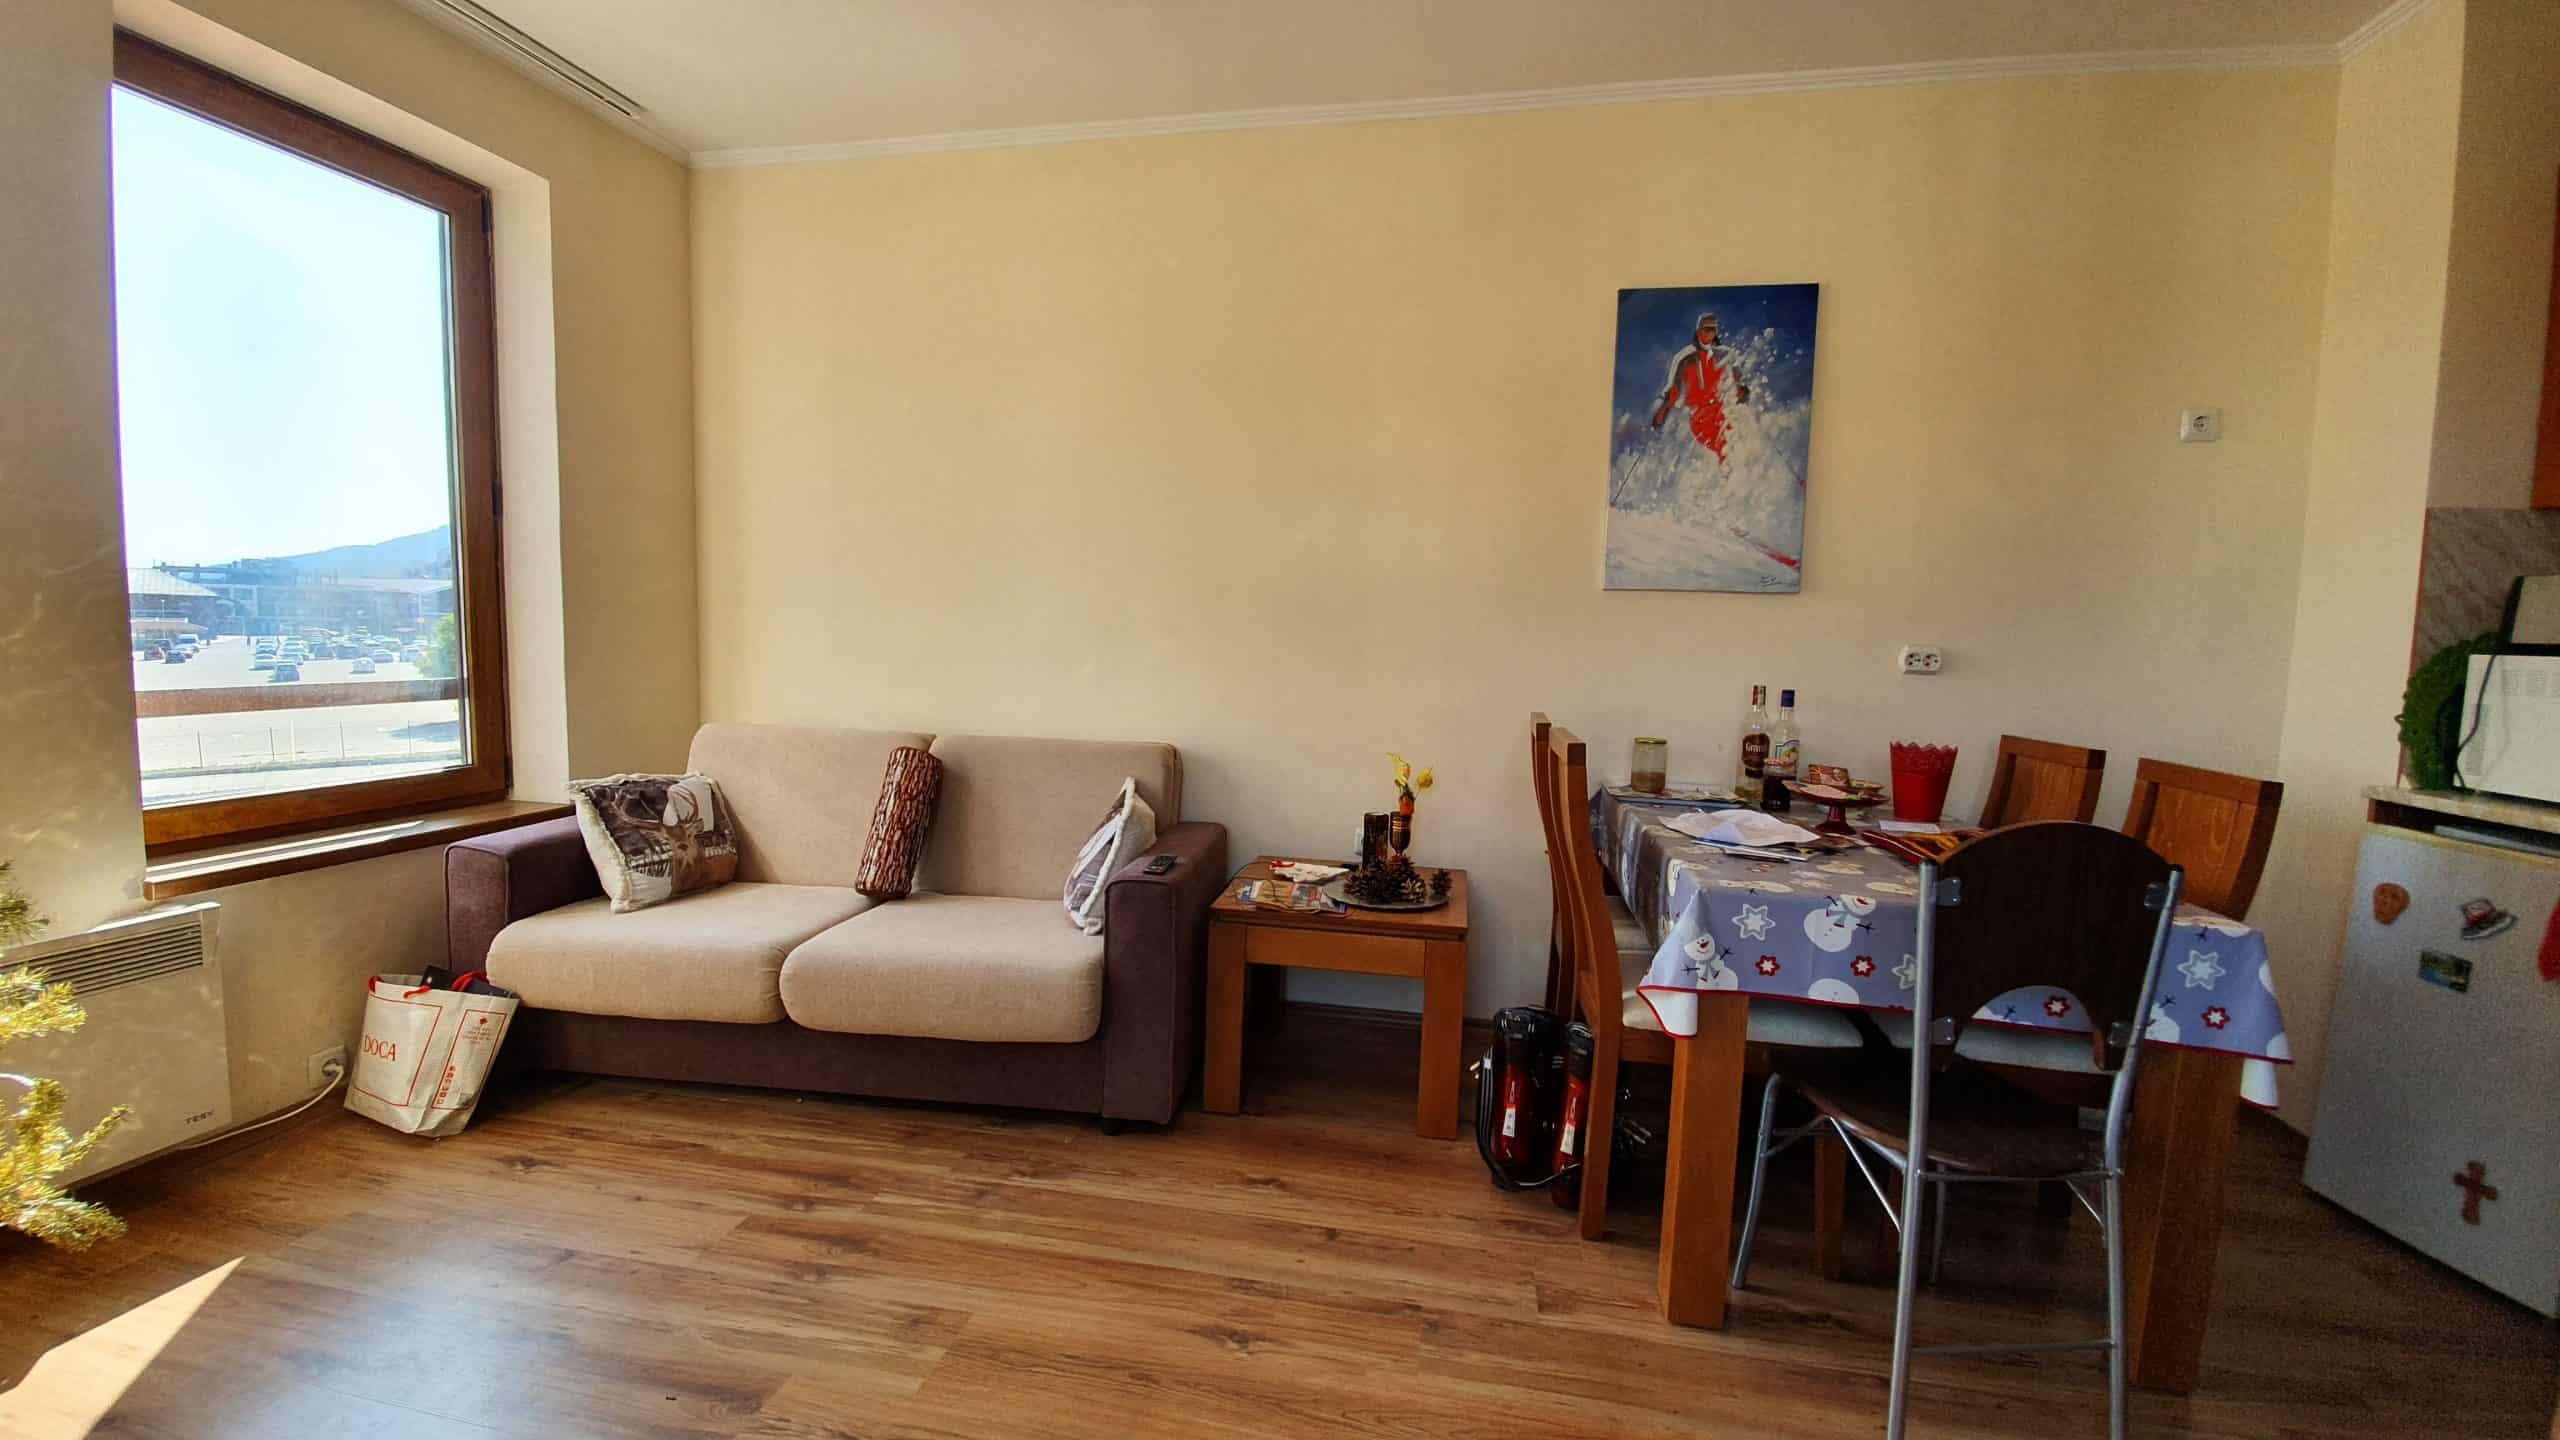 1-bedroom apartment near the Gondola lift in Bansko